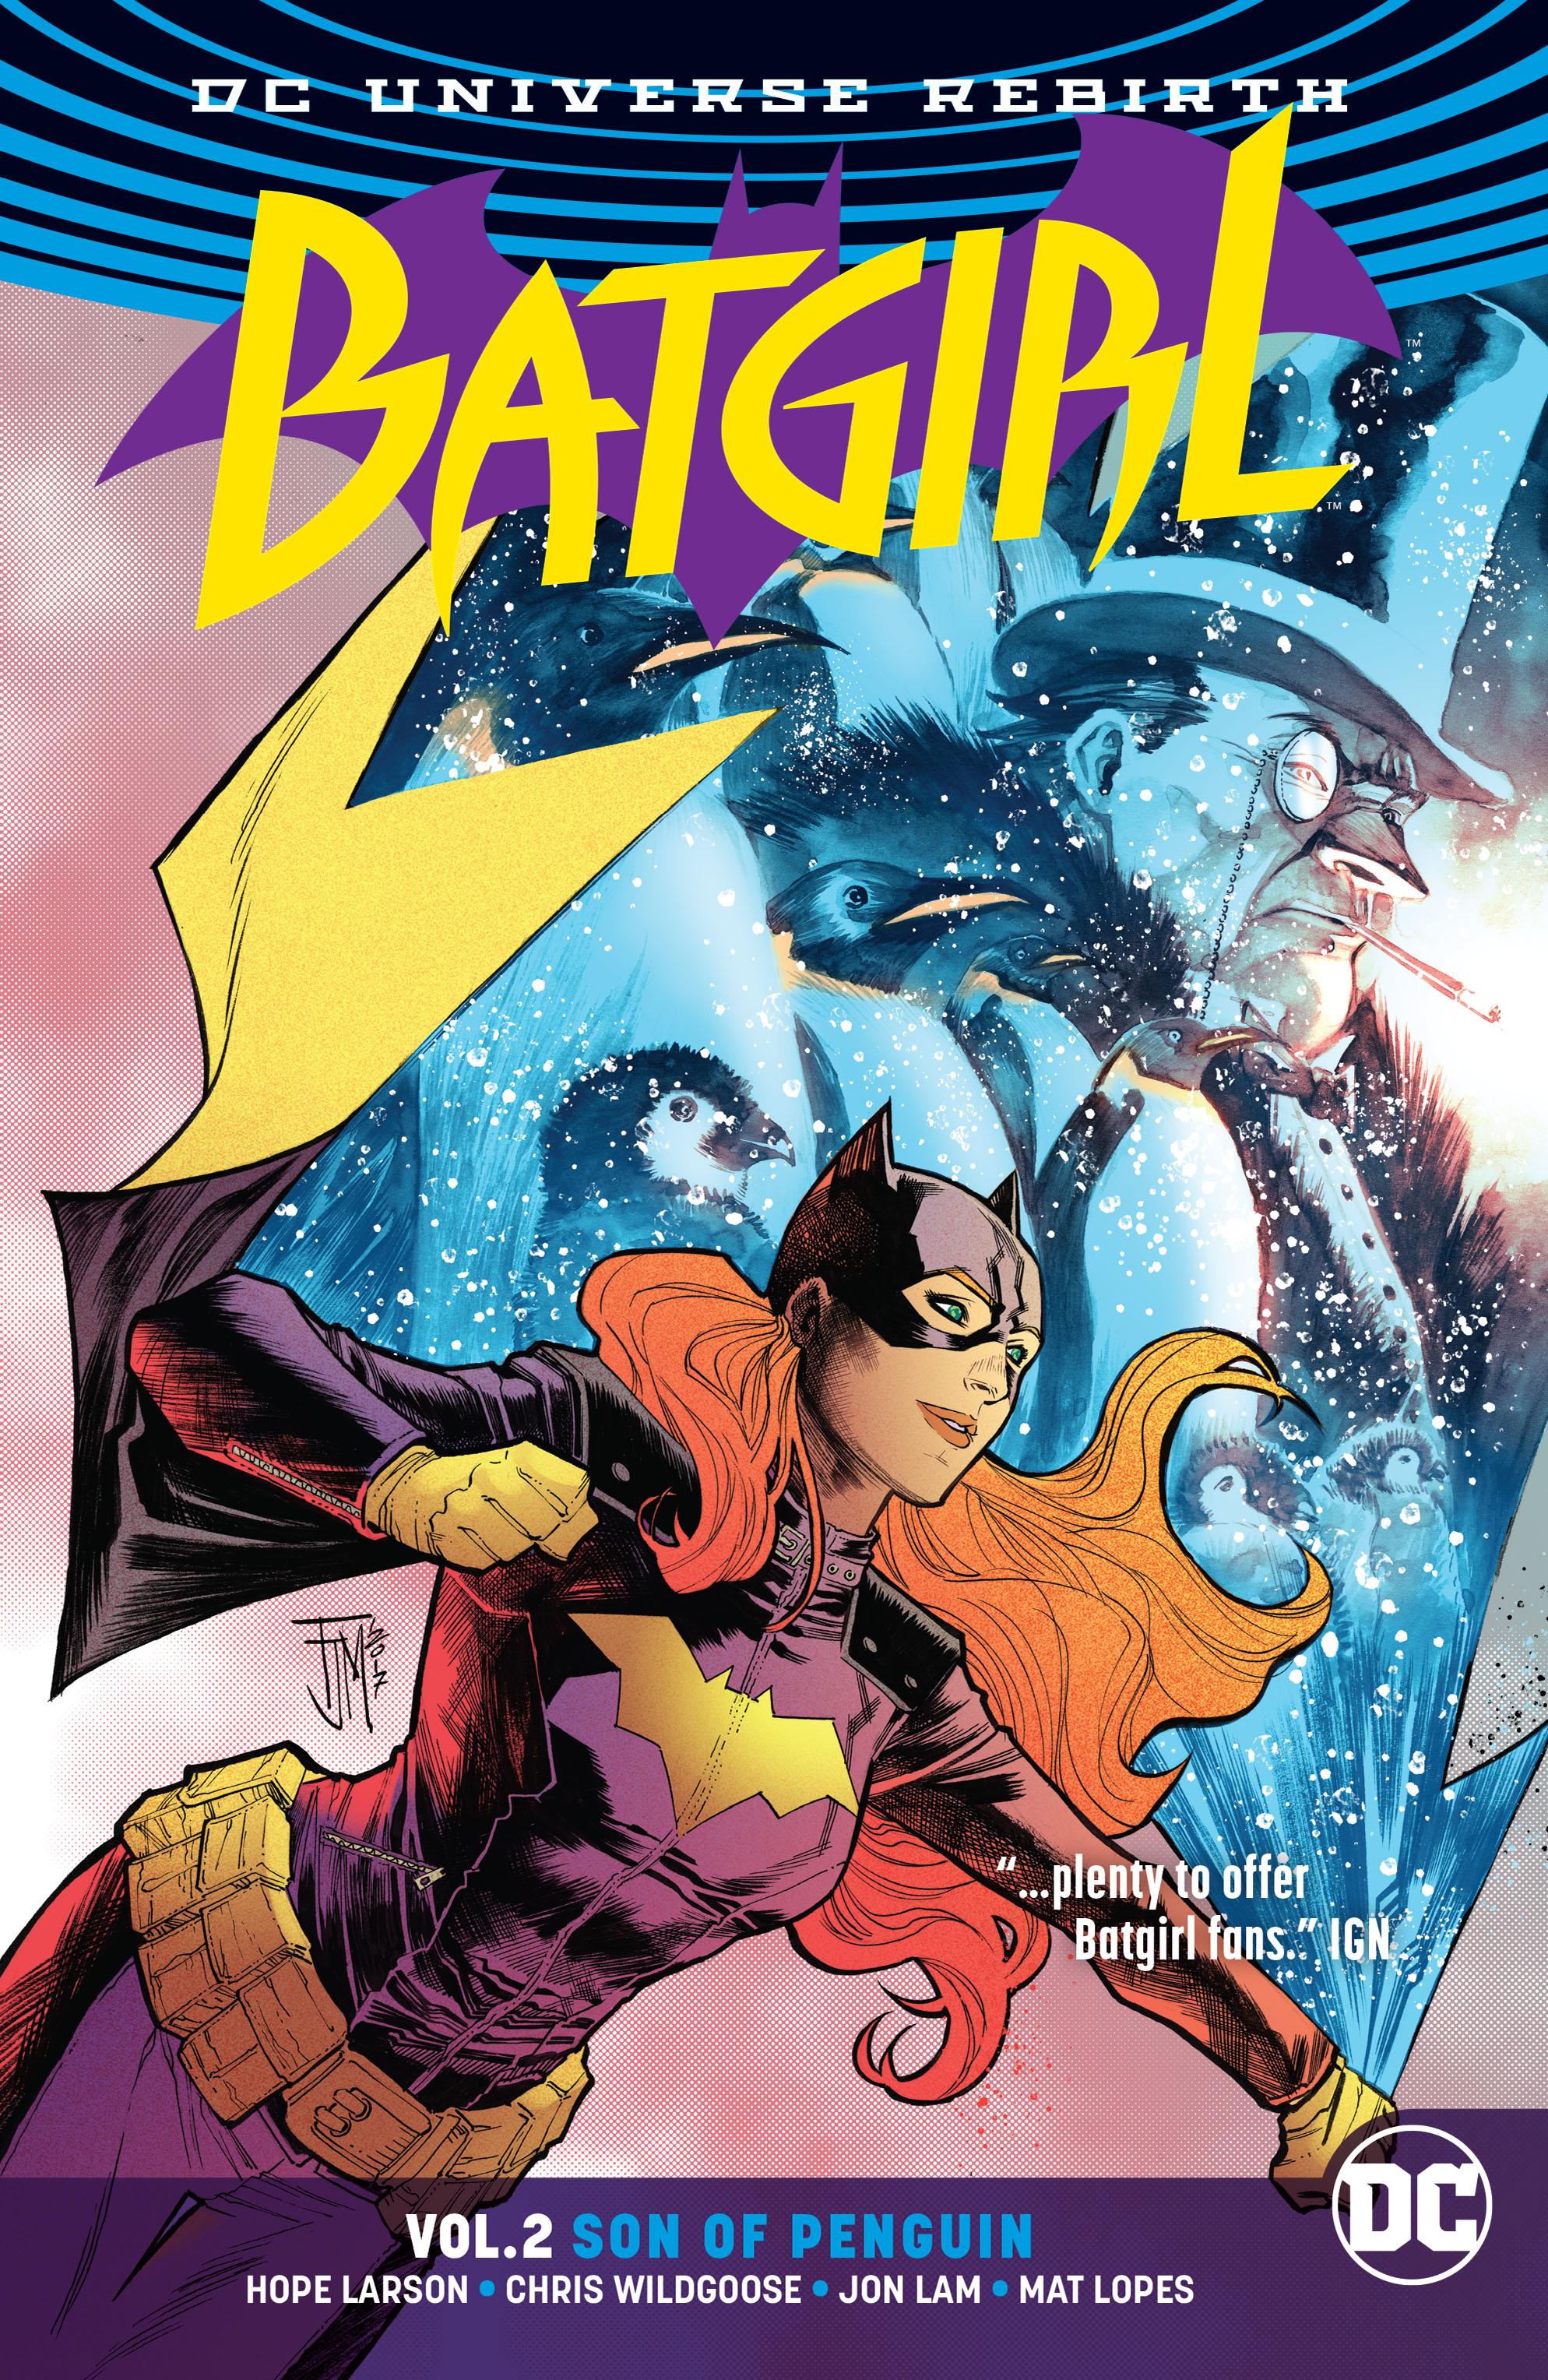 Batman and batgirl dating quotes